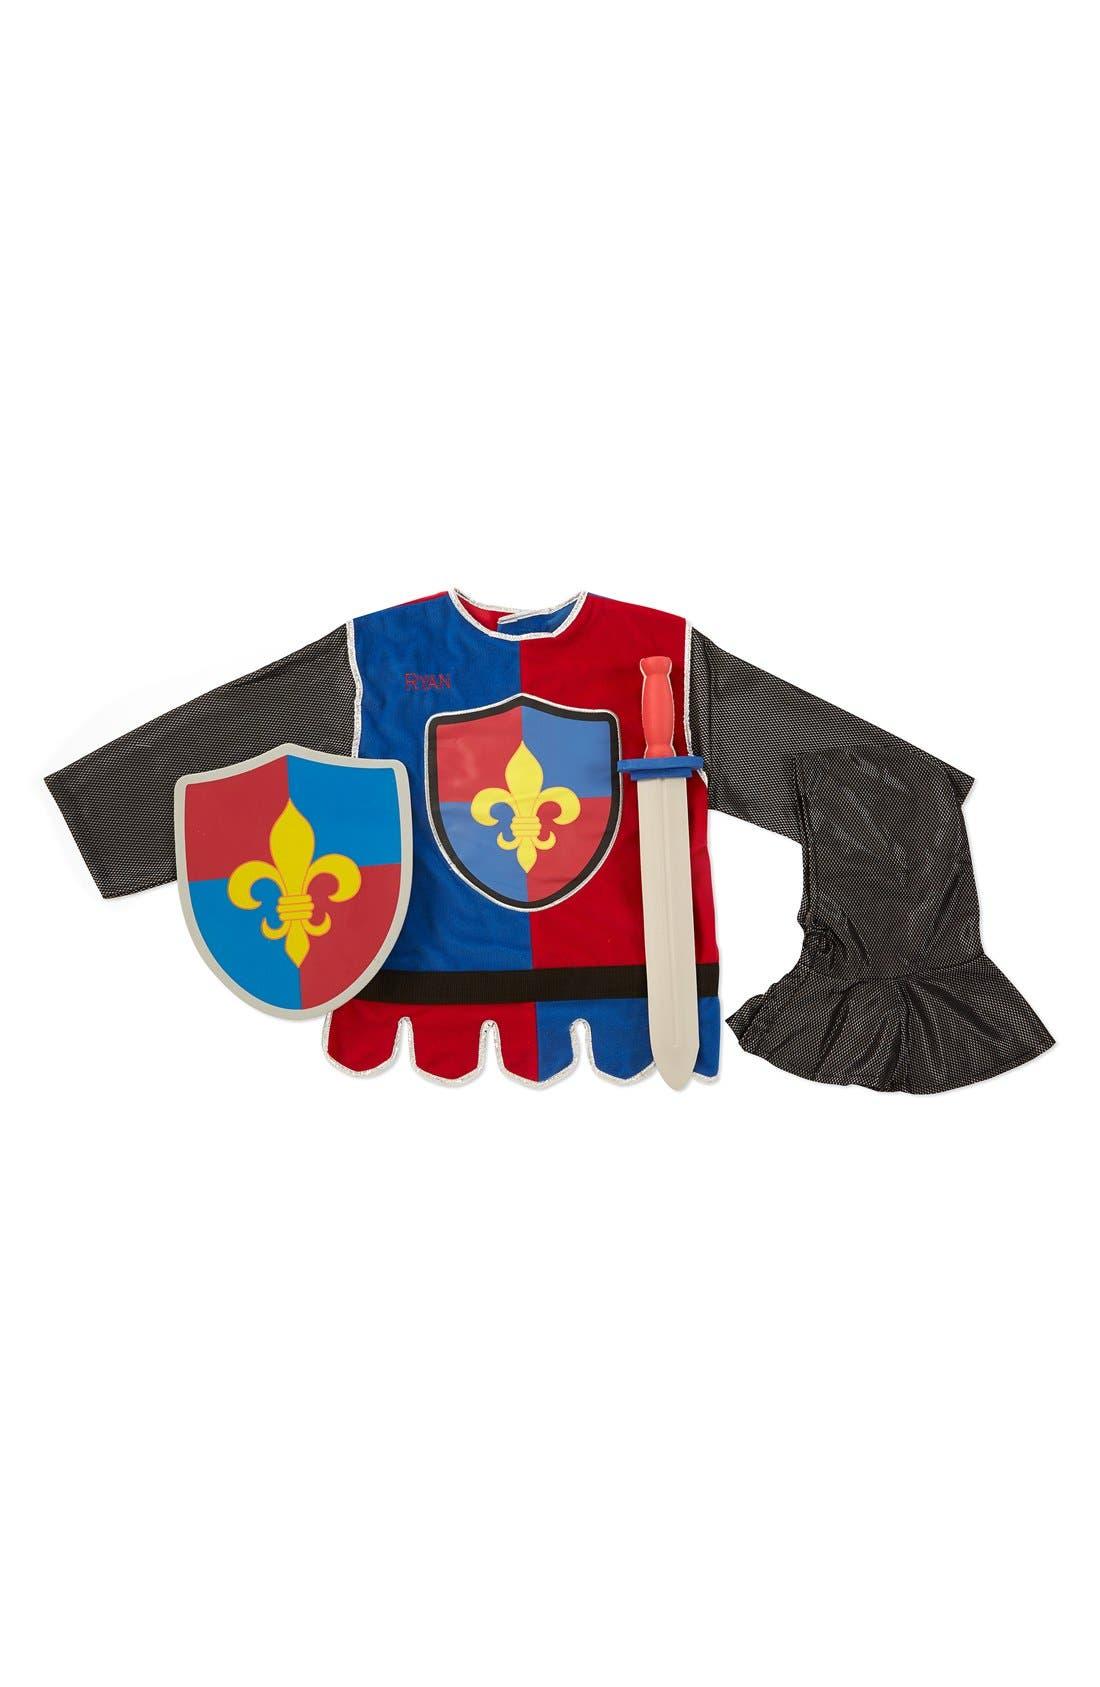 Main Image - Melissa & Doug 'Knight' Personalized Costume Set (Little Kid)